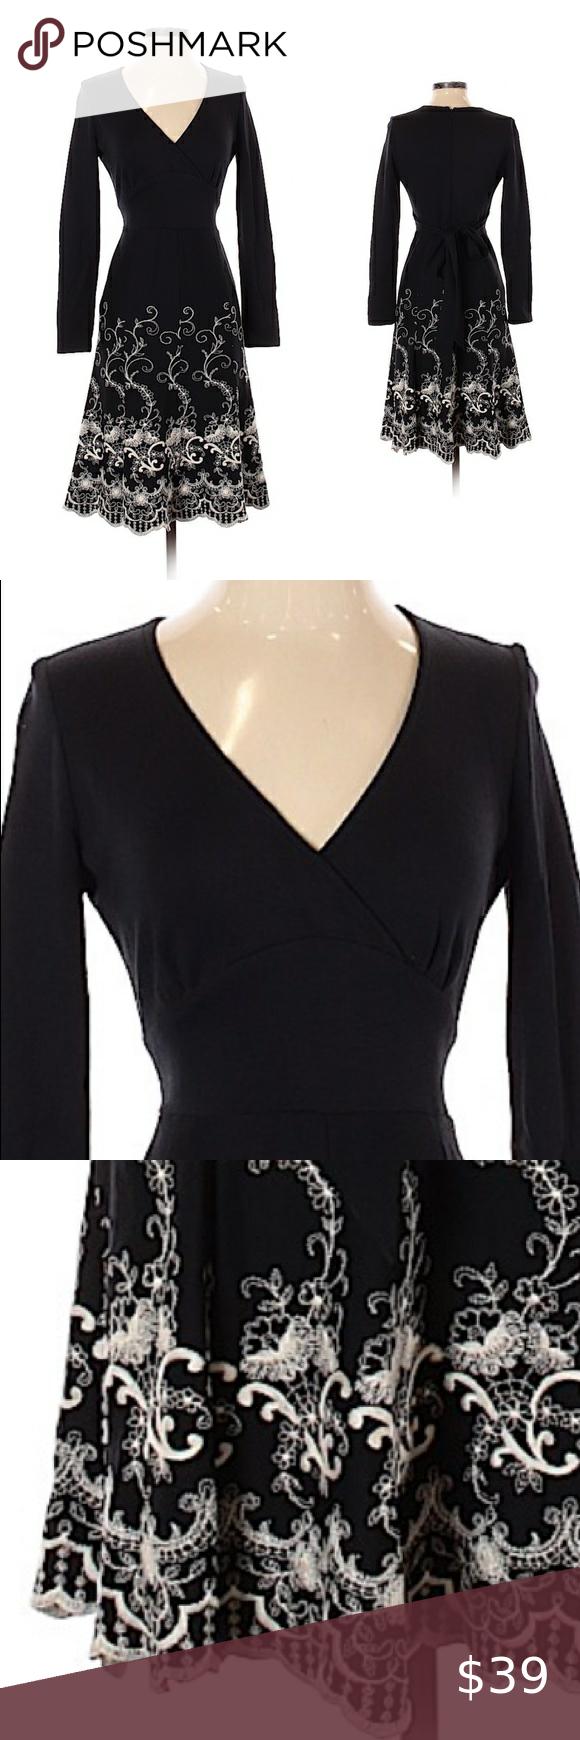 Chetta B Black Long Sleeve Fit And Flare Dress Fit And Flare Dress Flare Dress Dresses [ 1740 x 580 Pixel ]